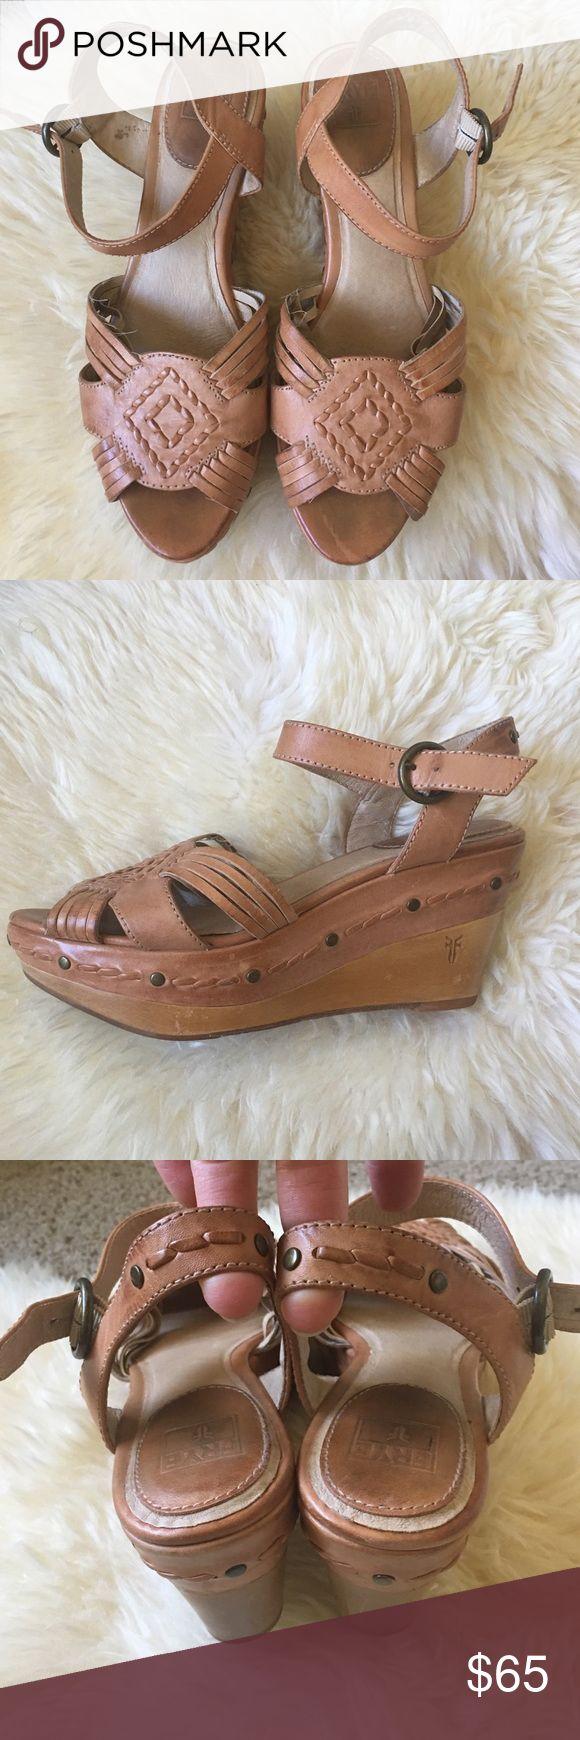 Frye Sandals Carlie Huarache Frye Wedge Sandals In Tan